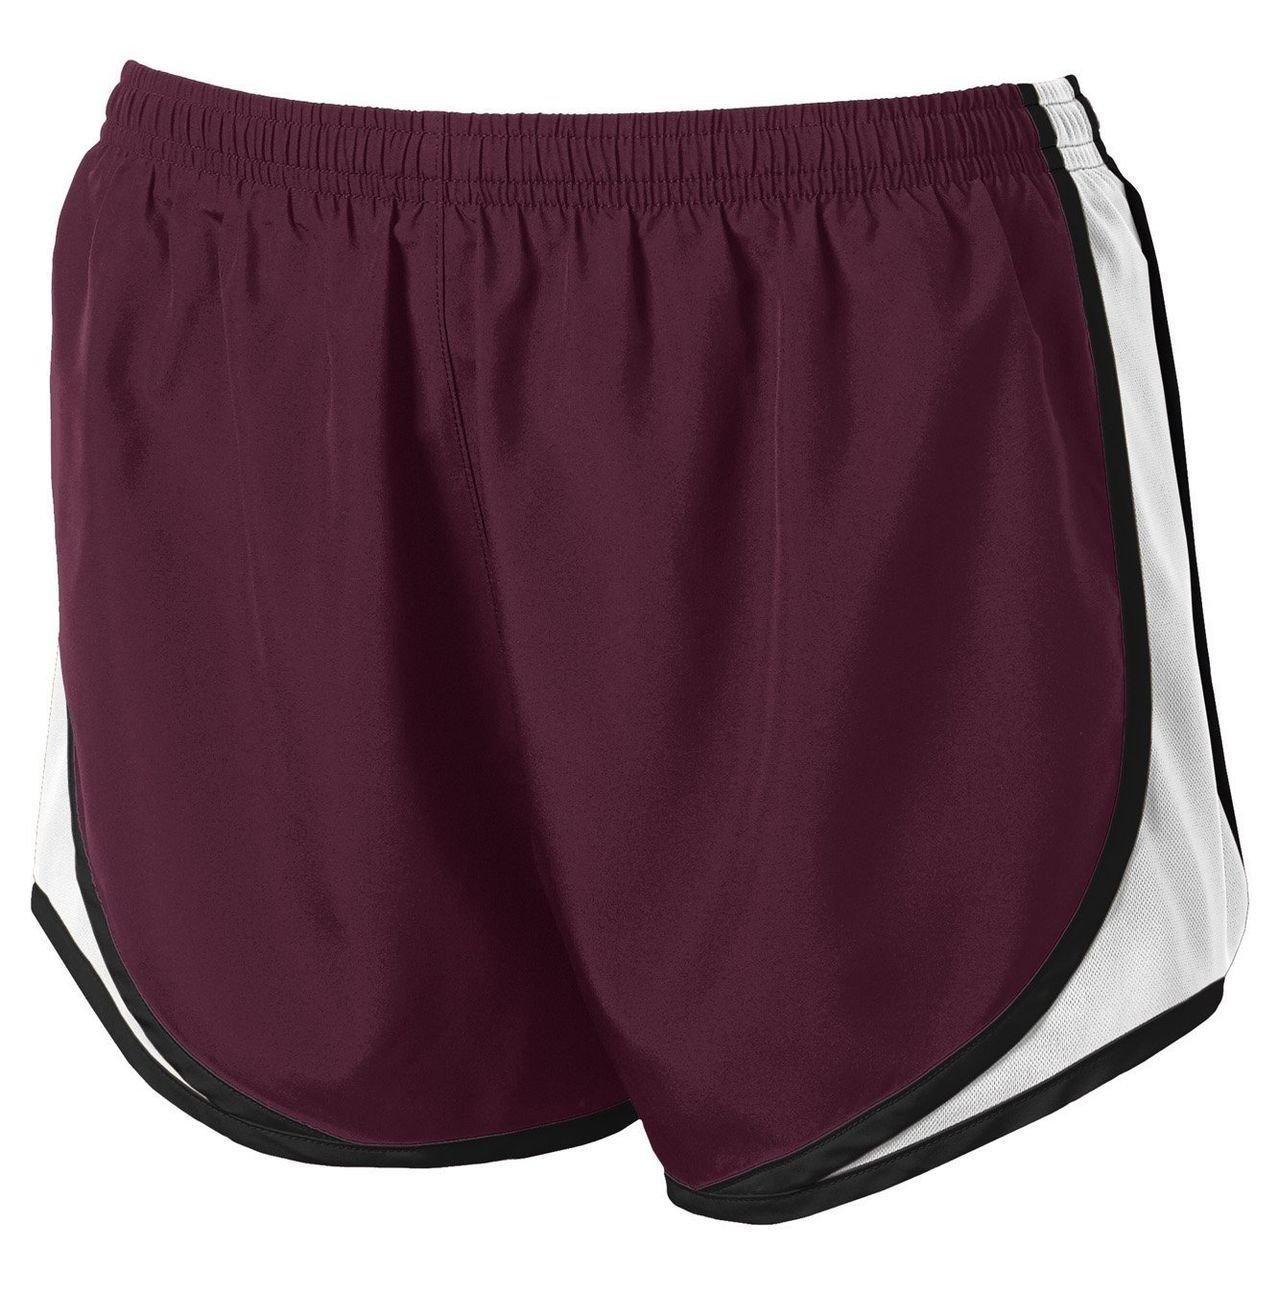 Clothe Co. Ladies Moisture Wicking Sport Running Shorts, Maroon/White/Black, XS